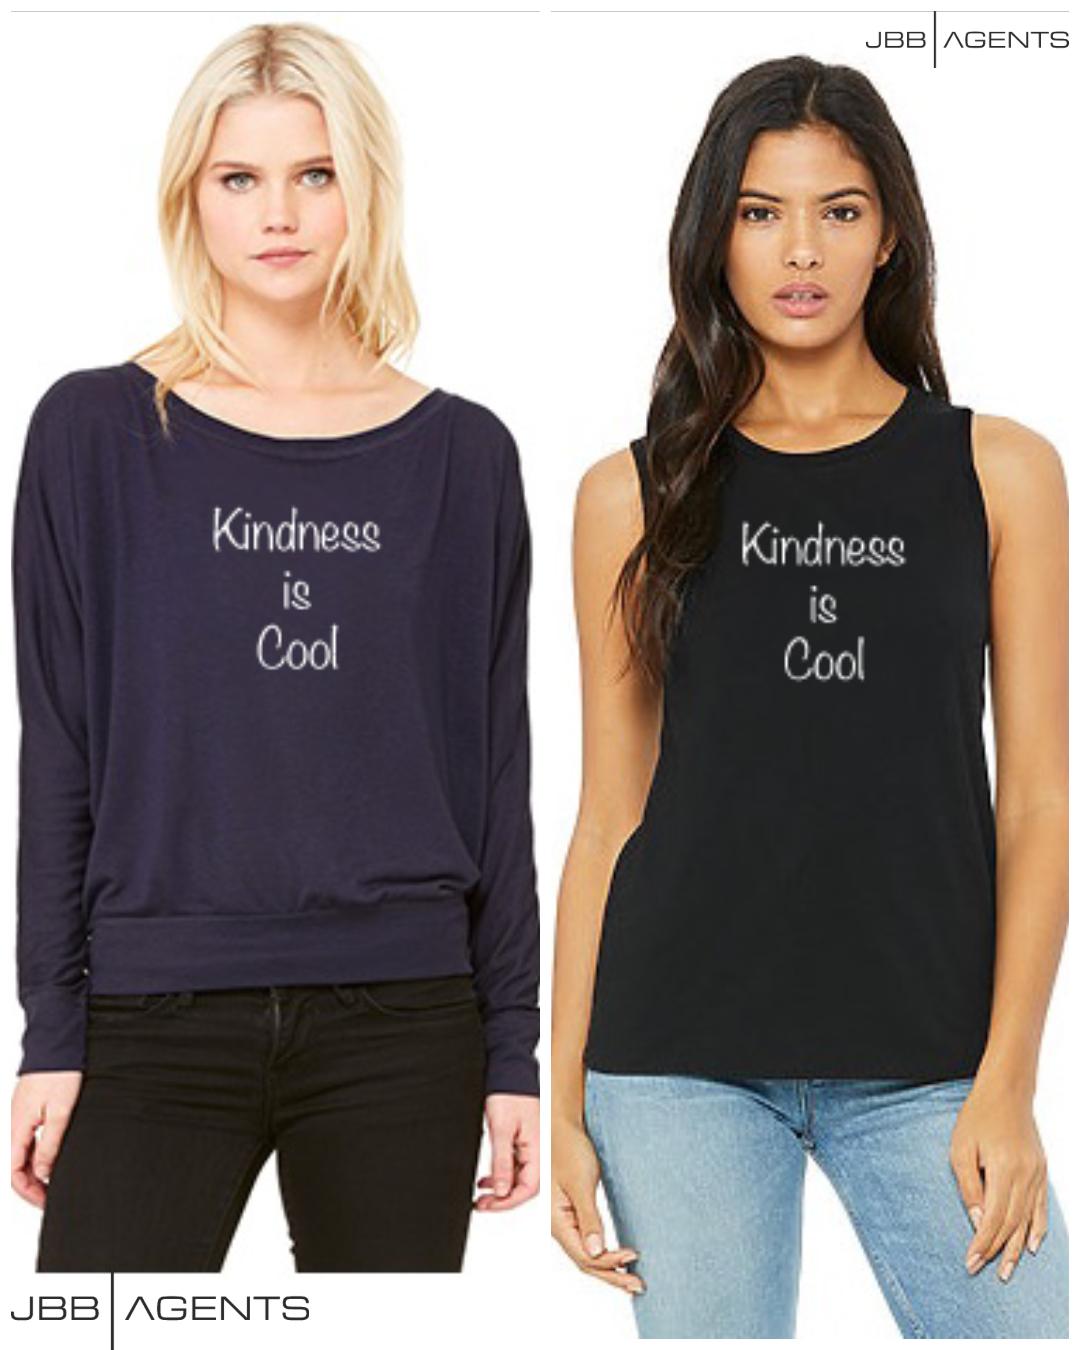 kindness is cool .jpg